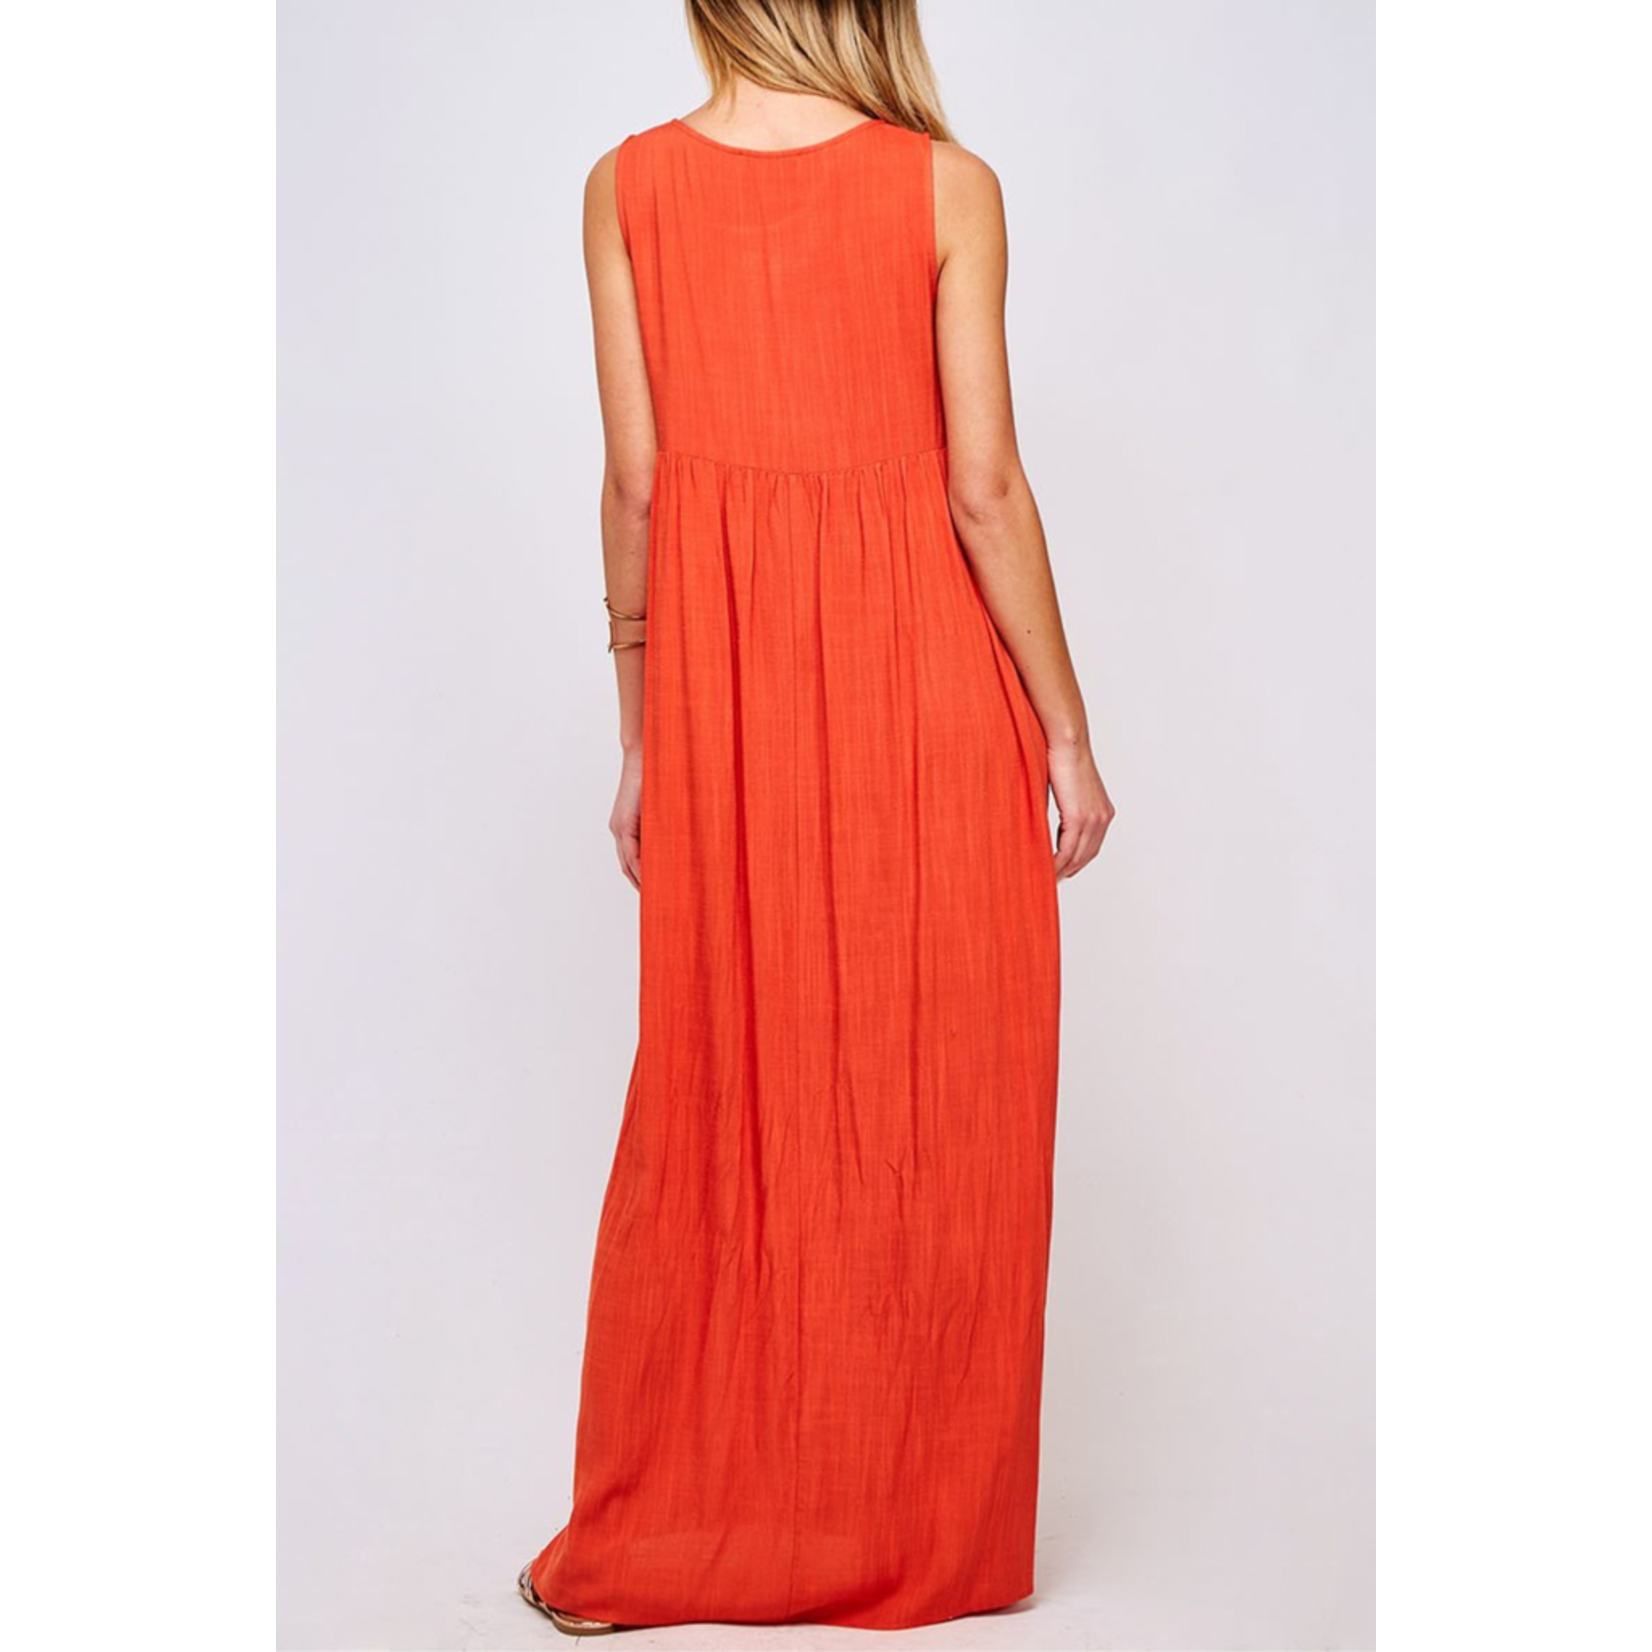 Peach Love CA Flowy maxi dress